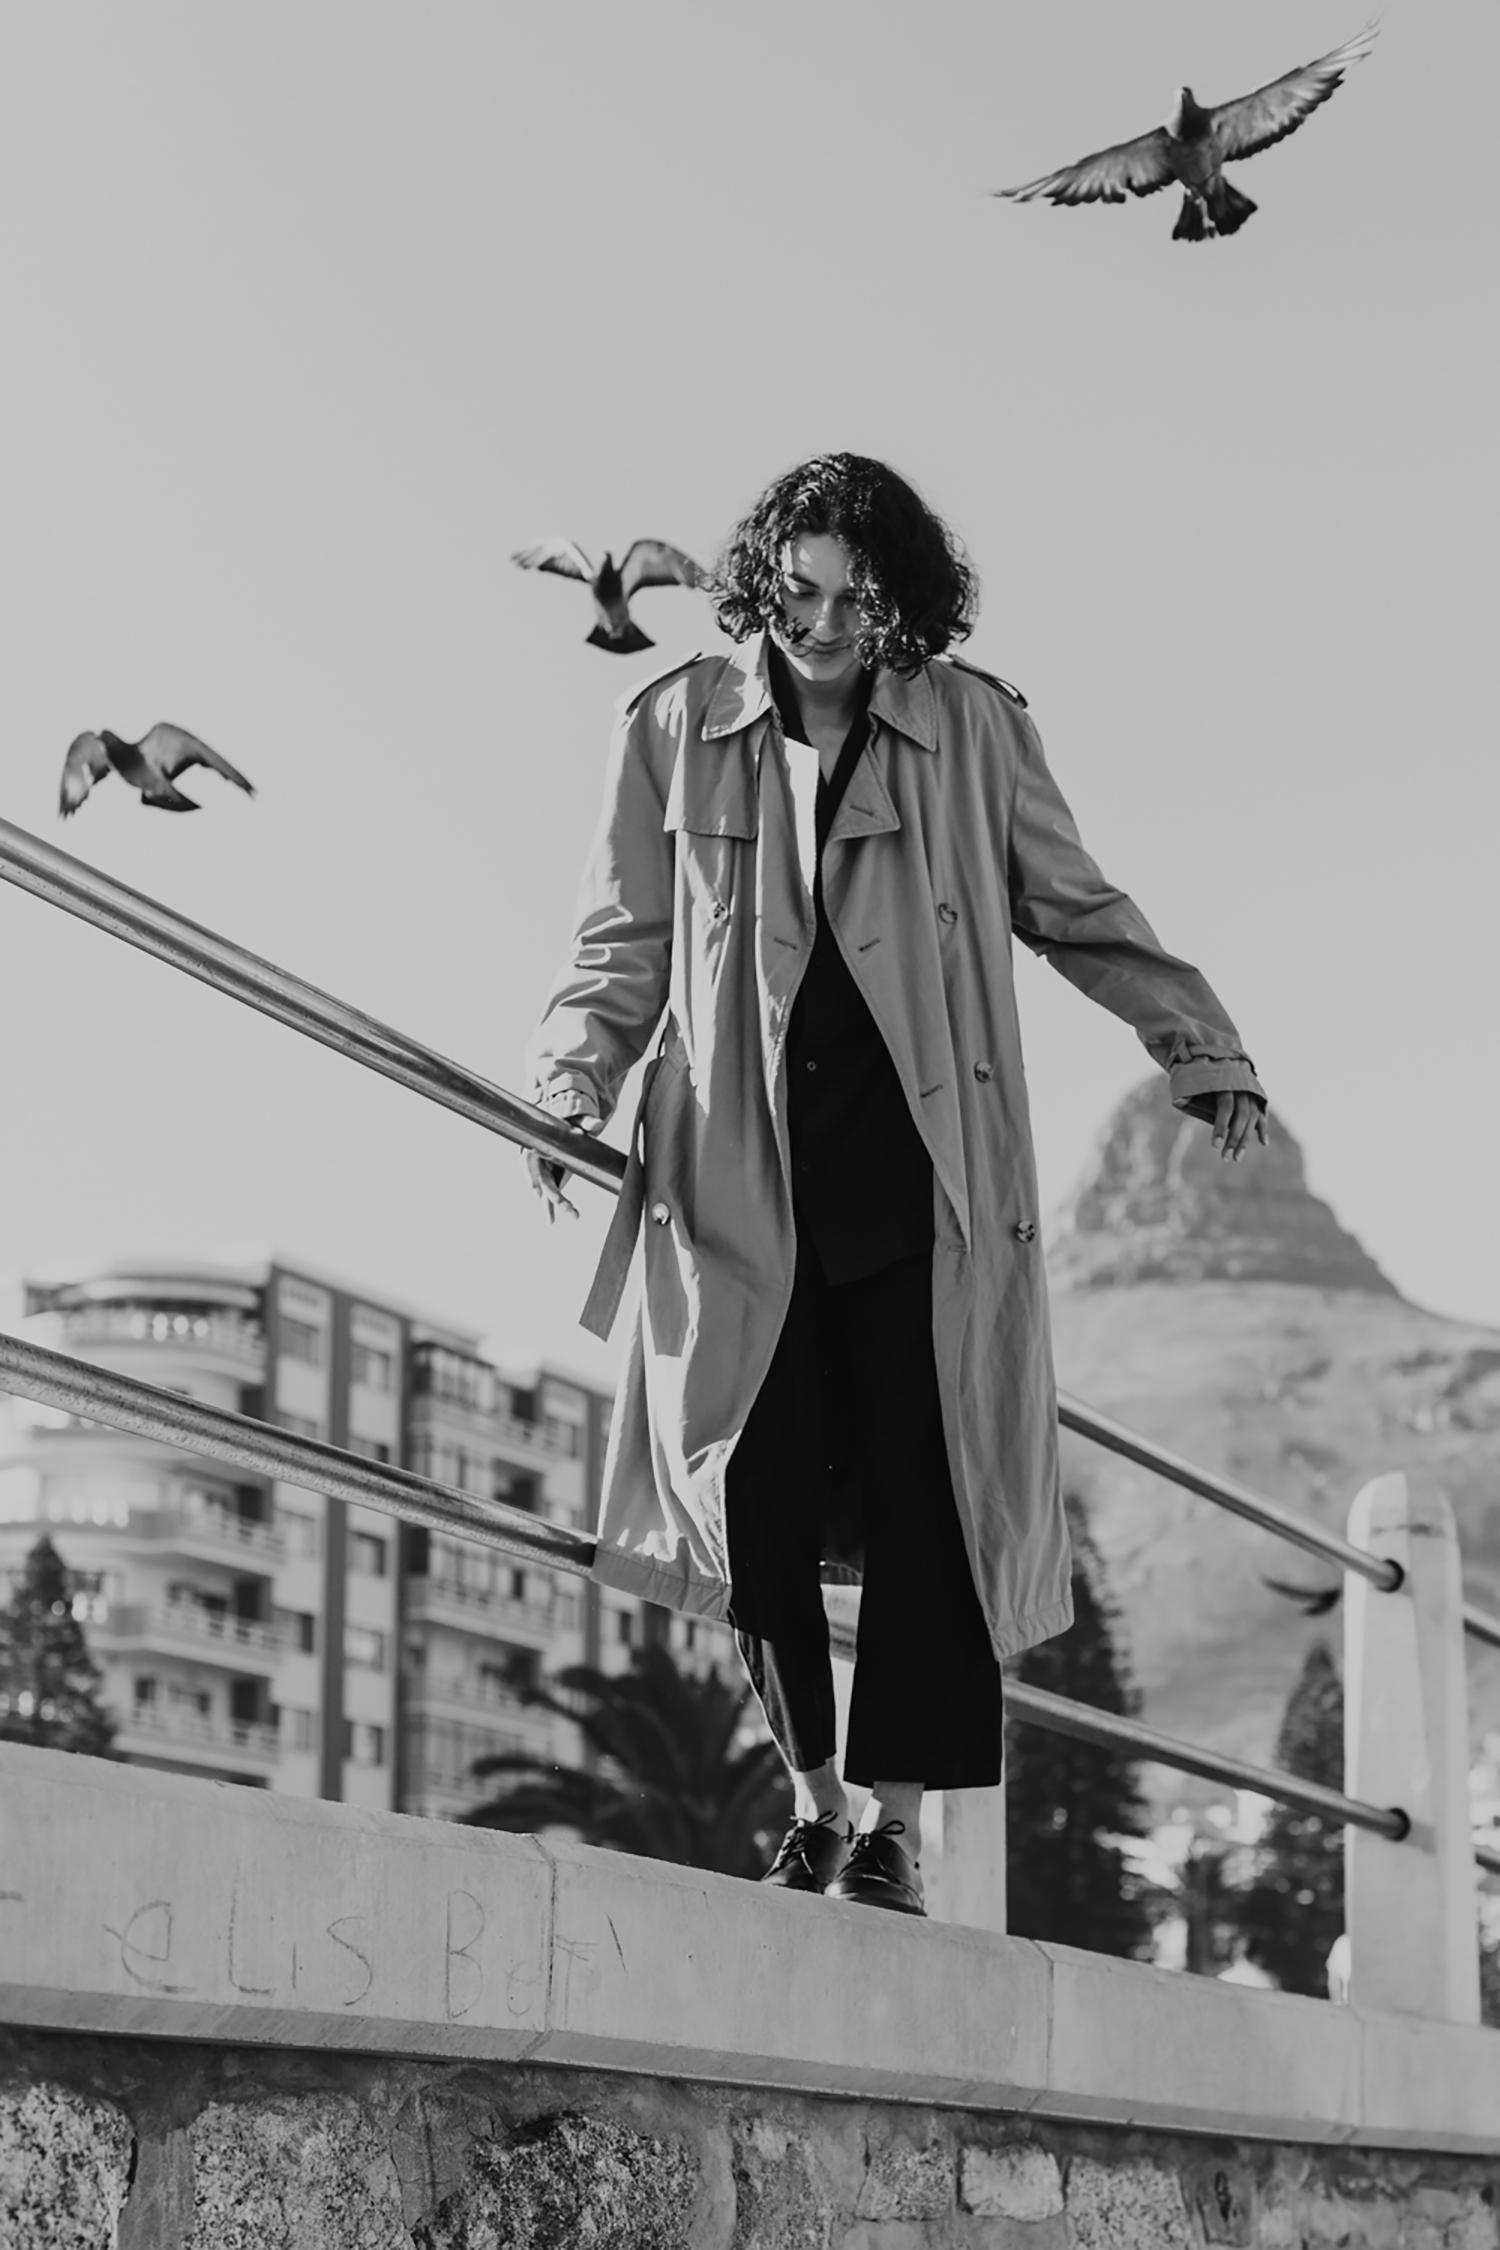 Hamburg-Fotograf-People-Lifestyle-Fashion-Editorial-Fotoproduktion-Anna-Fichtner-g-18